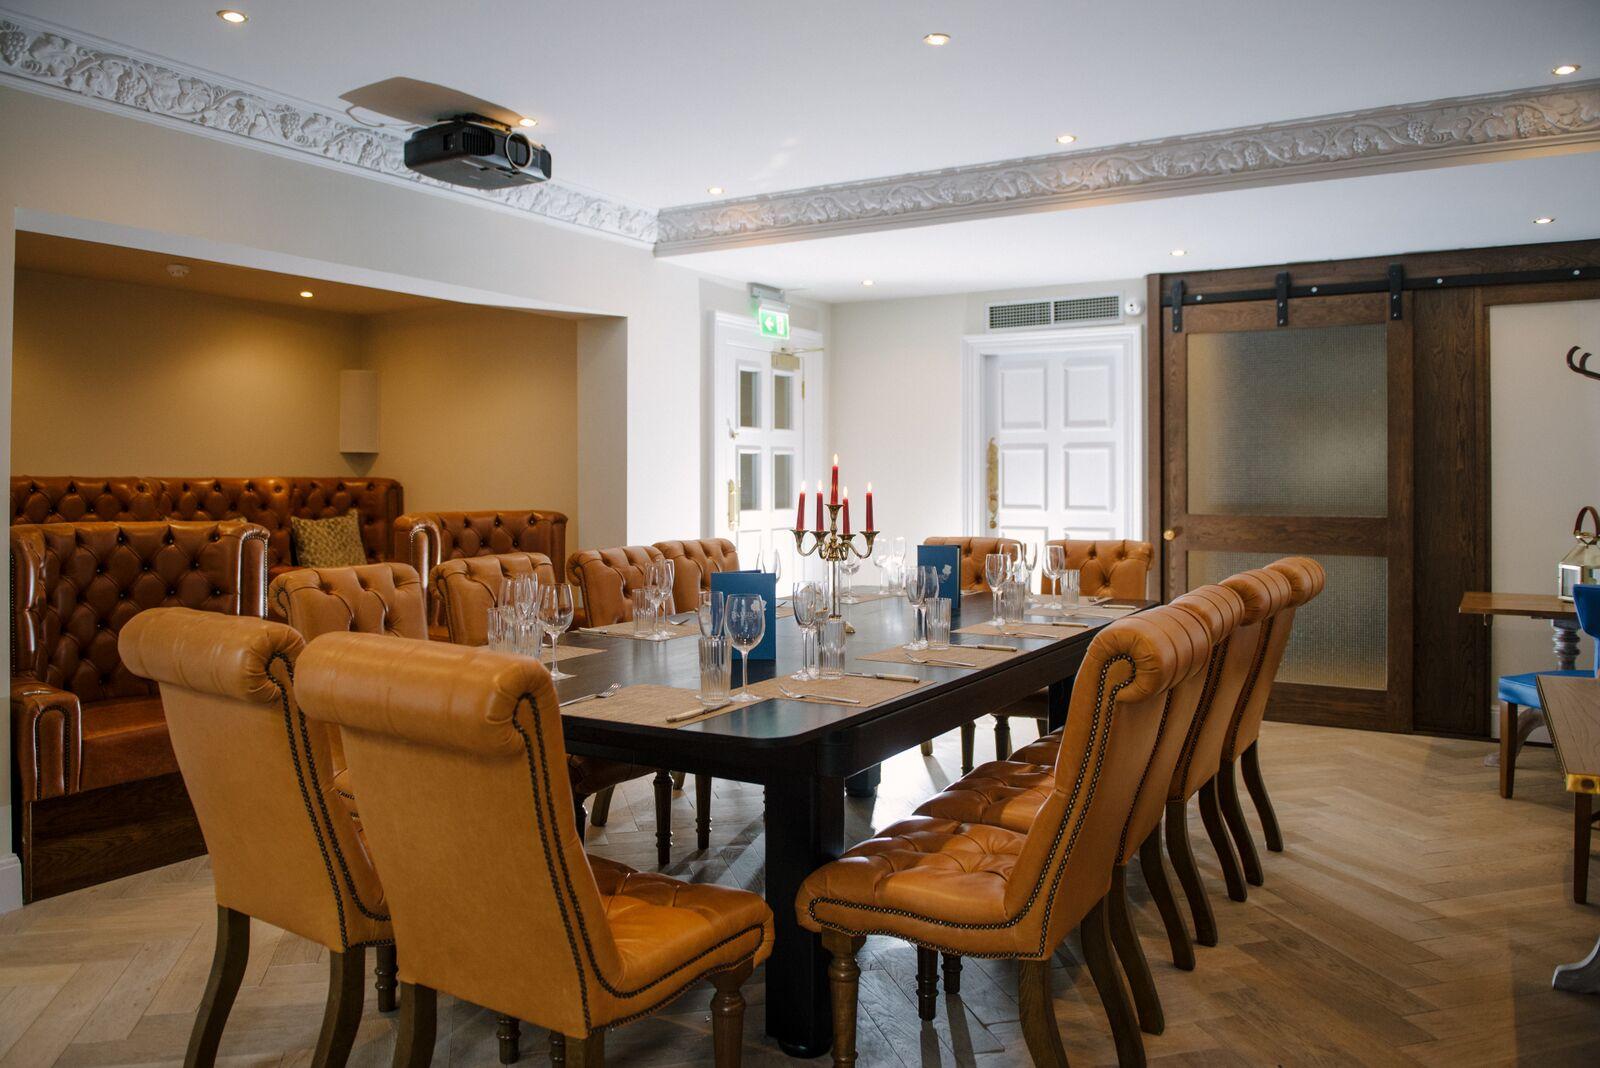 Badger & Co Private Dining Room Edinburgh EH2 3HT